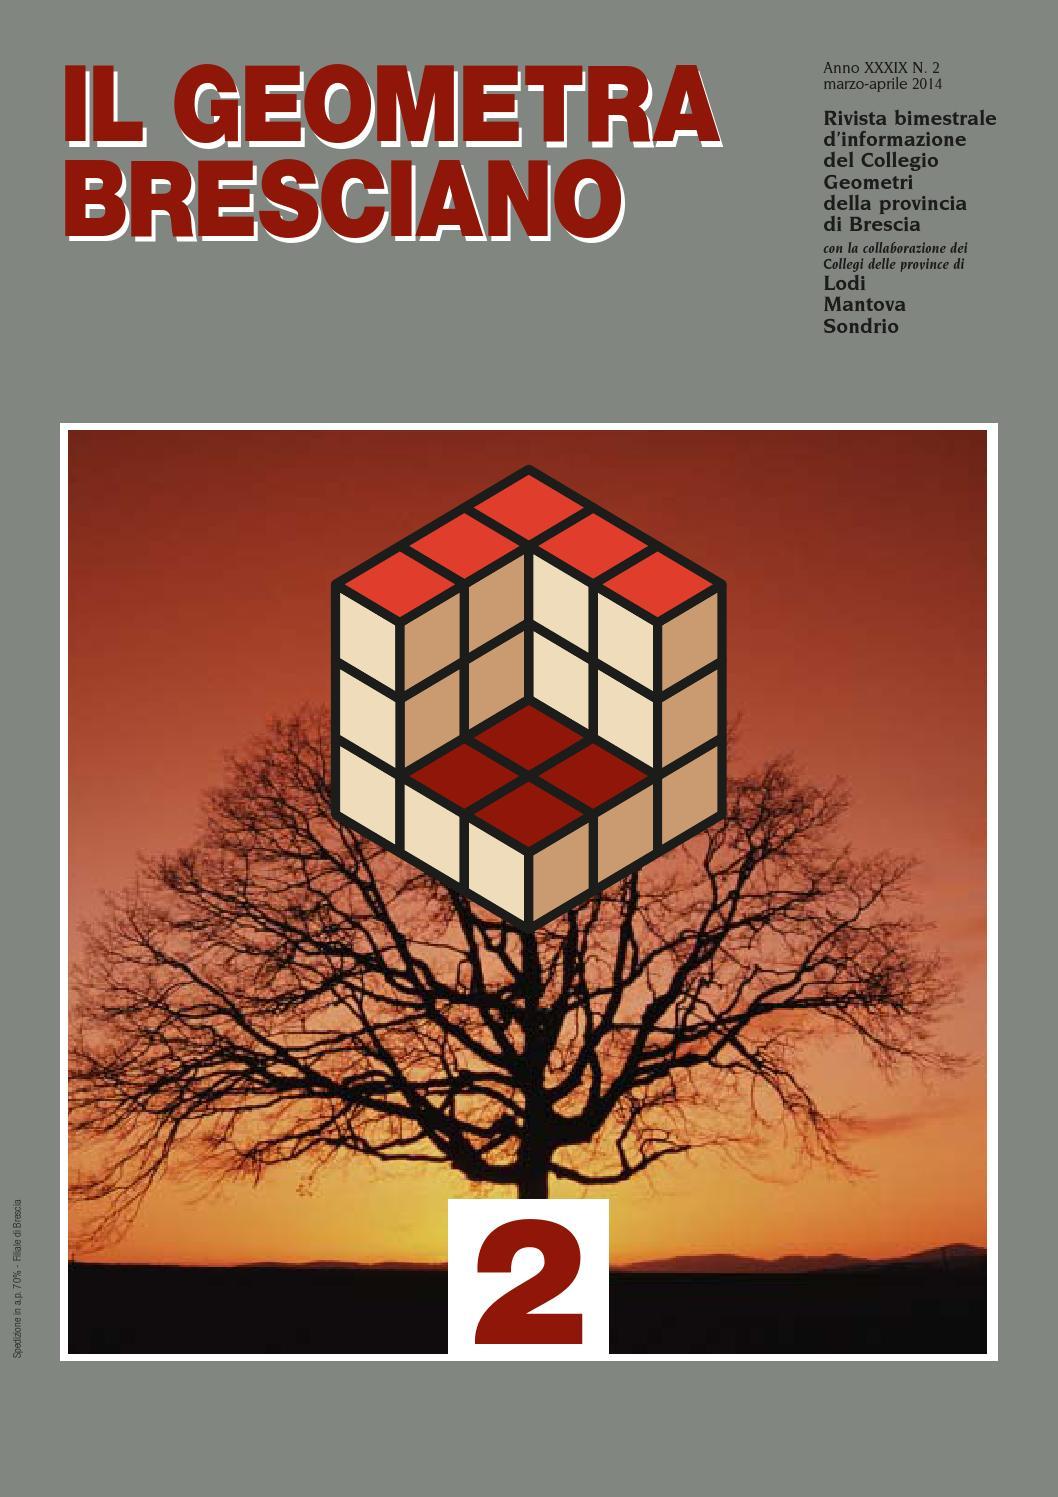 Il Geometra Bresciano - n.2 del 2014 by EMMEDIGI Pubblicità - issuu 5459331fd20